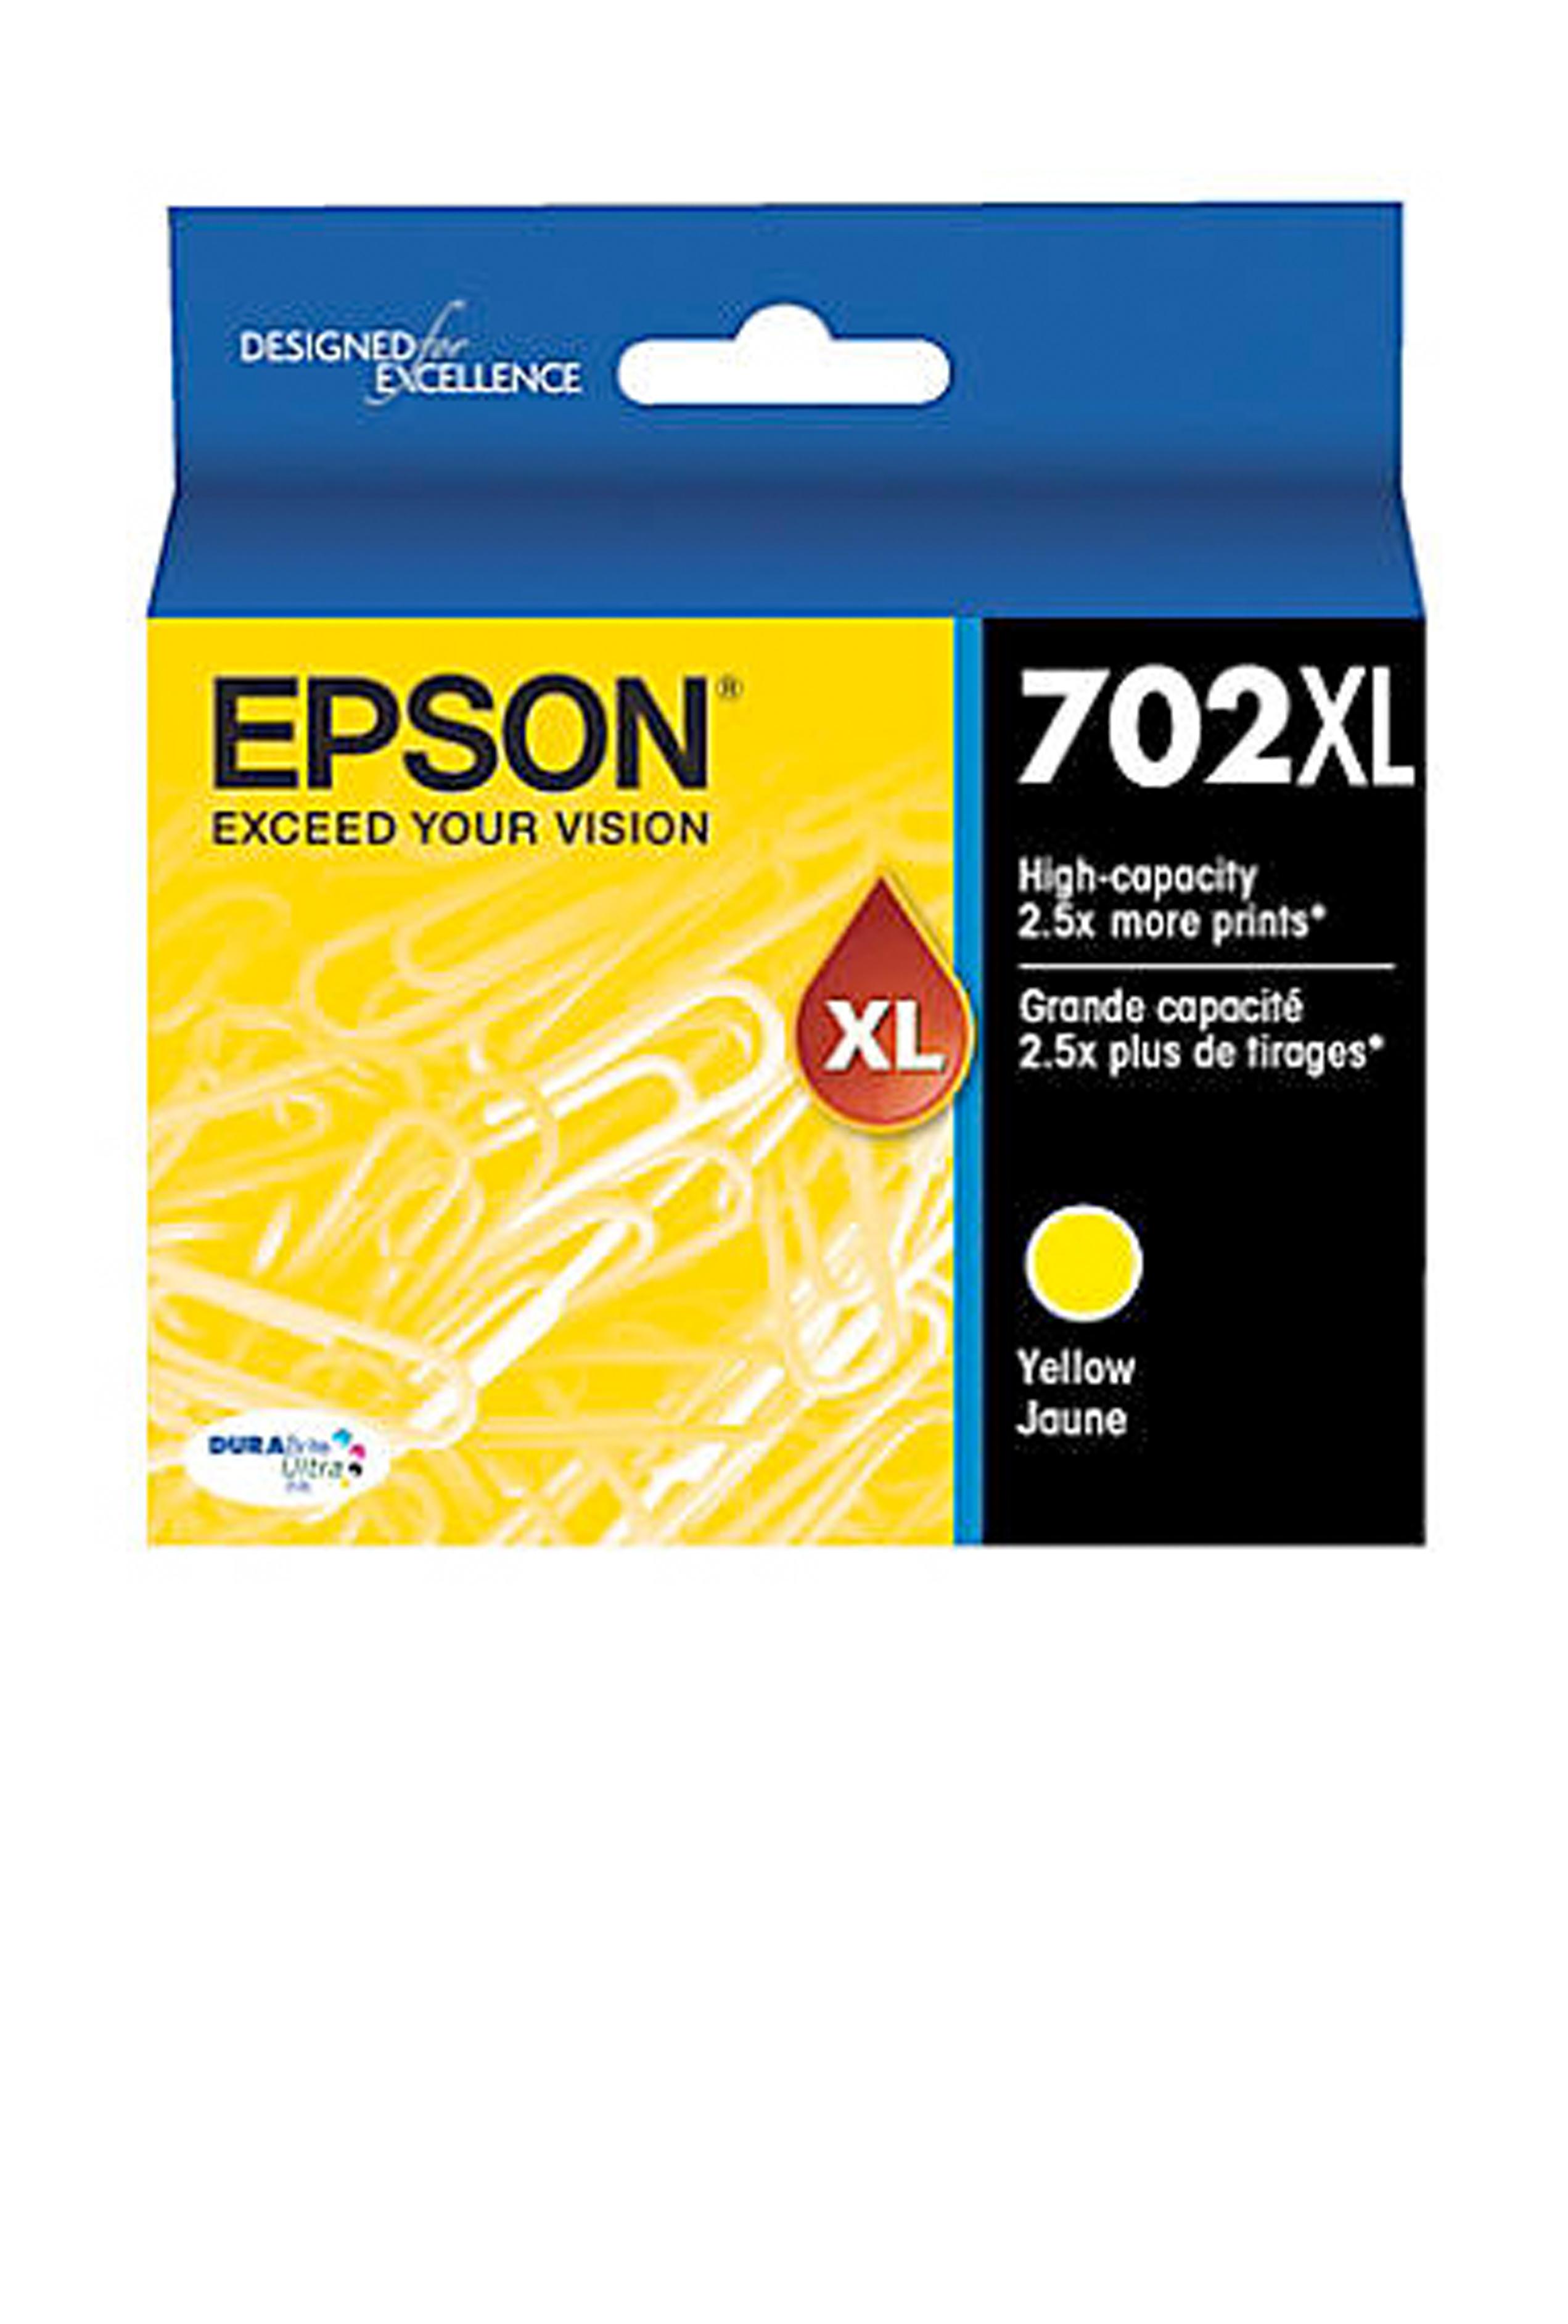 Epson T702XL, Yellow Ink Cartridge, High-capacity (T702XL420-S)